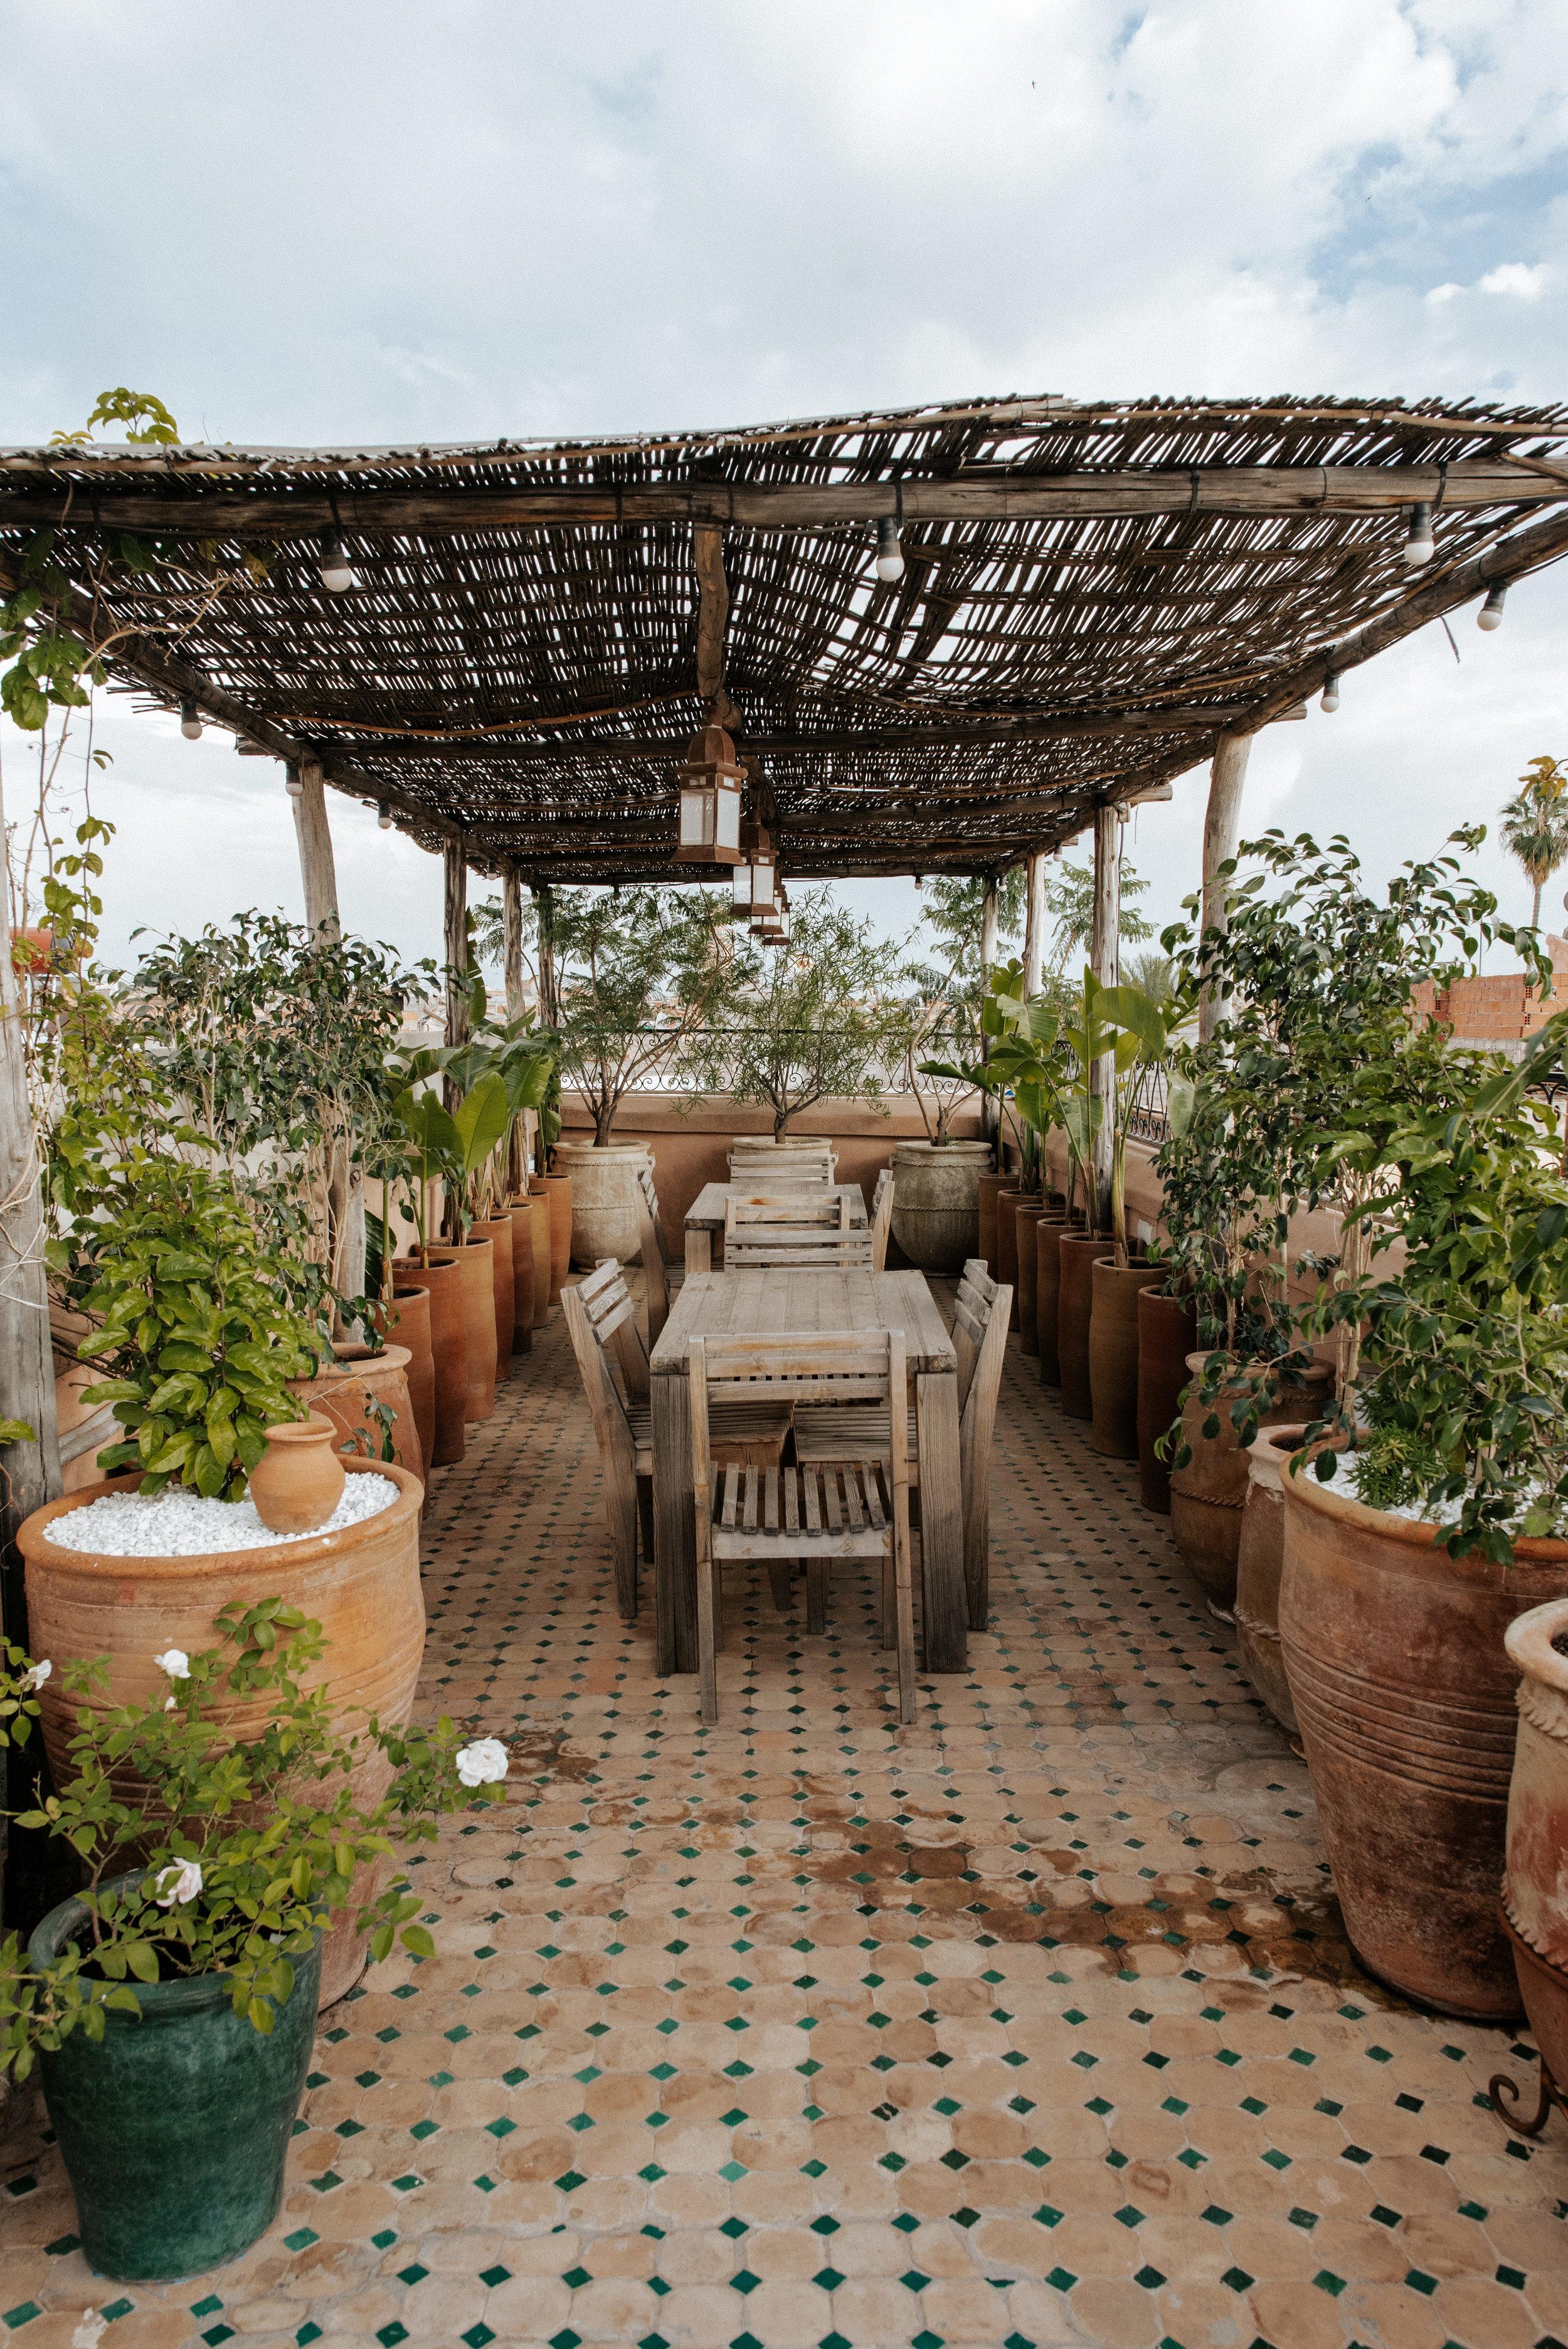 Morocco-470.jpg